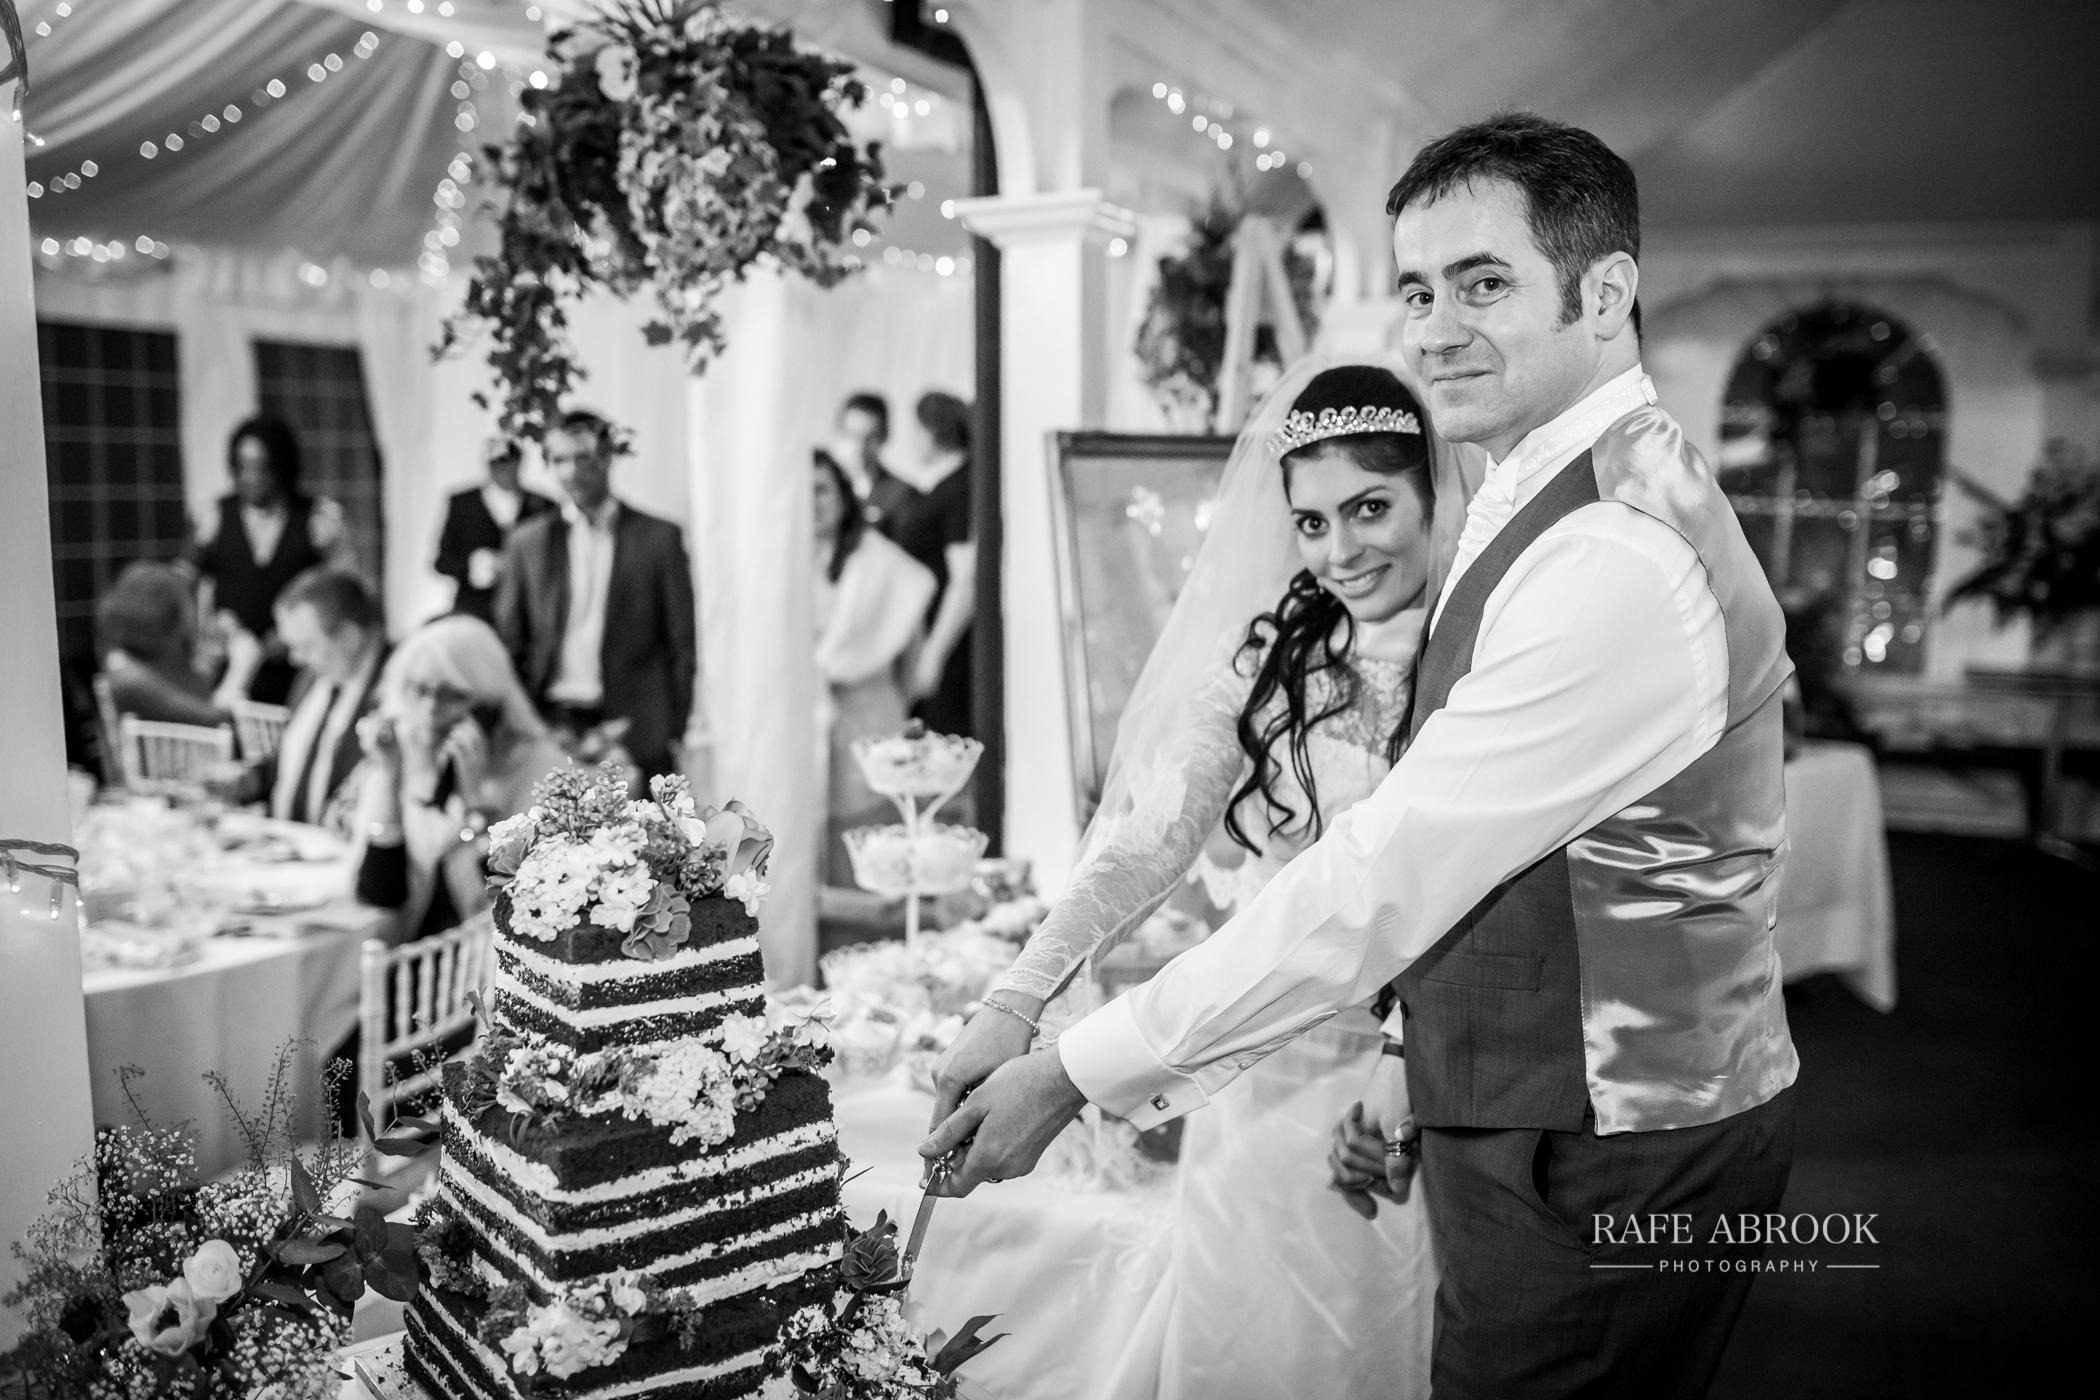 roma & pete wedding hampstead shenley hertfordshire -476.jpg